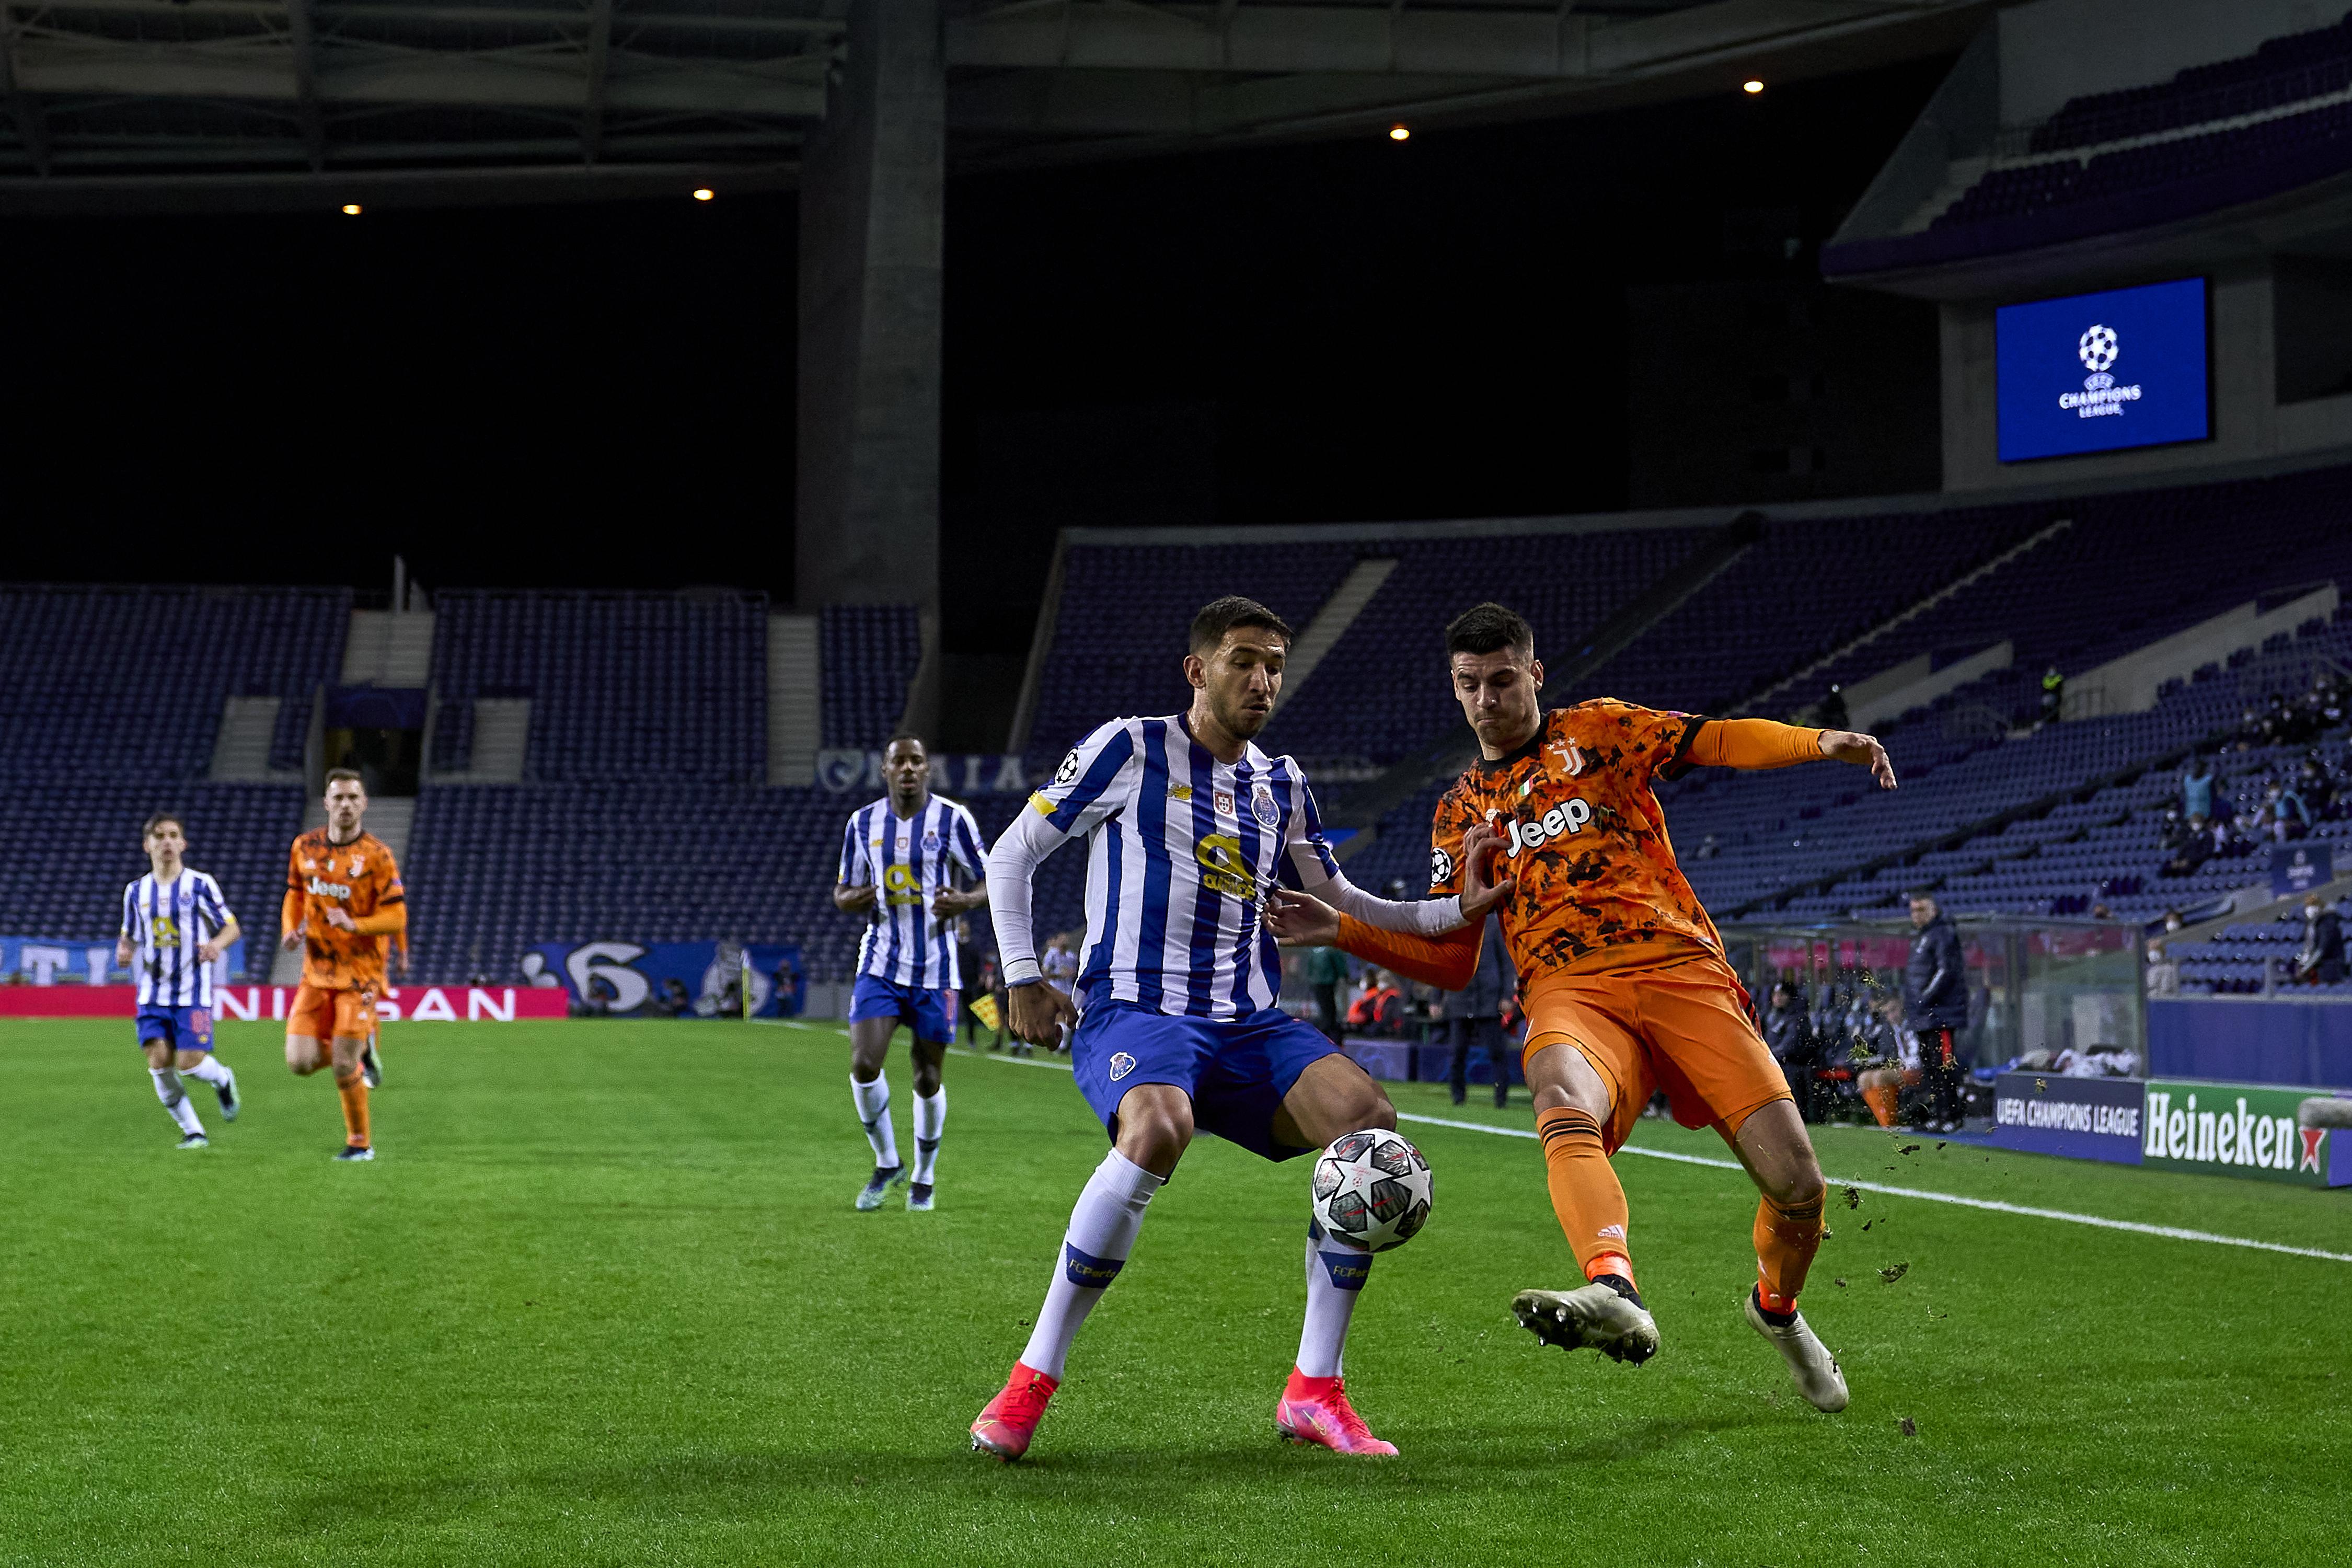 Marko Grujic Fc Porto在欧洲联盟冠军联赛16场比赛中与Juventus的Alvaro Morata竞争球,在FC Porto和Juventus于2月17日在葡萄牙波尔图,葡萄牙博士举行的16场比赛。